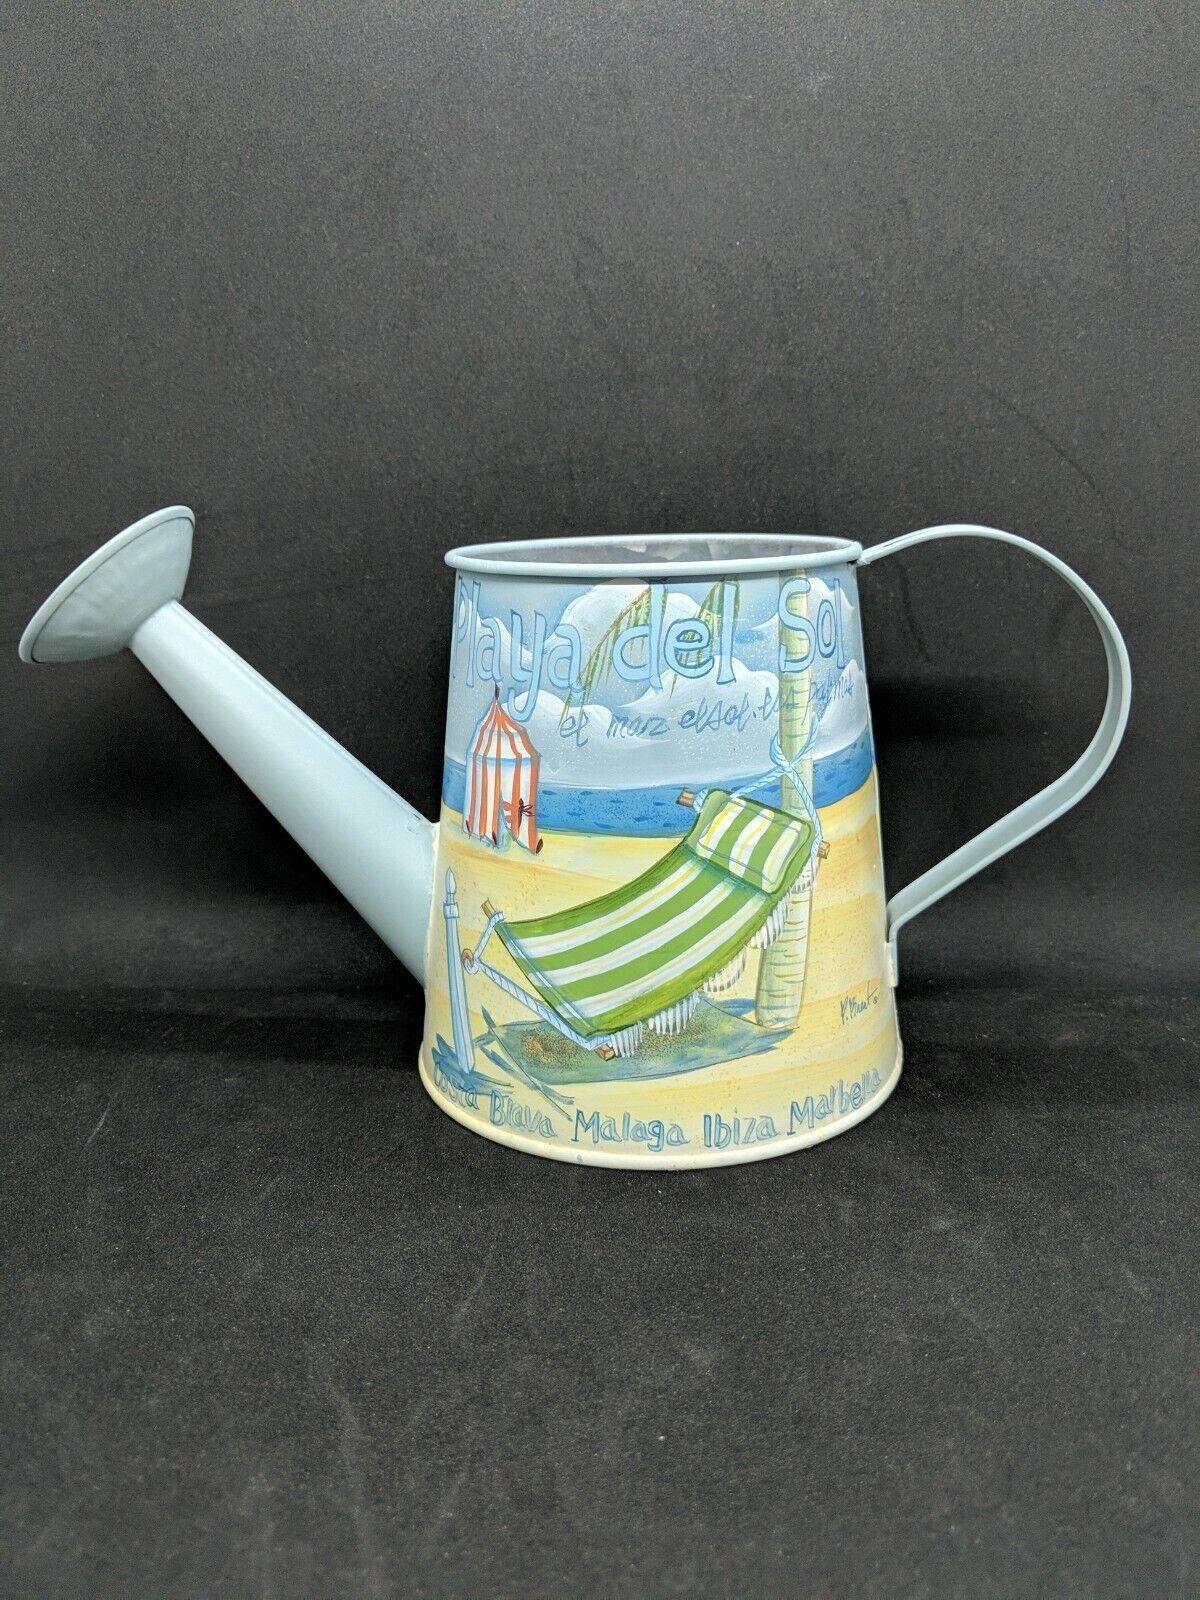 Small Metal Water Spraying Pot Garden Flower Kettle Watering Can